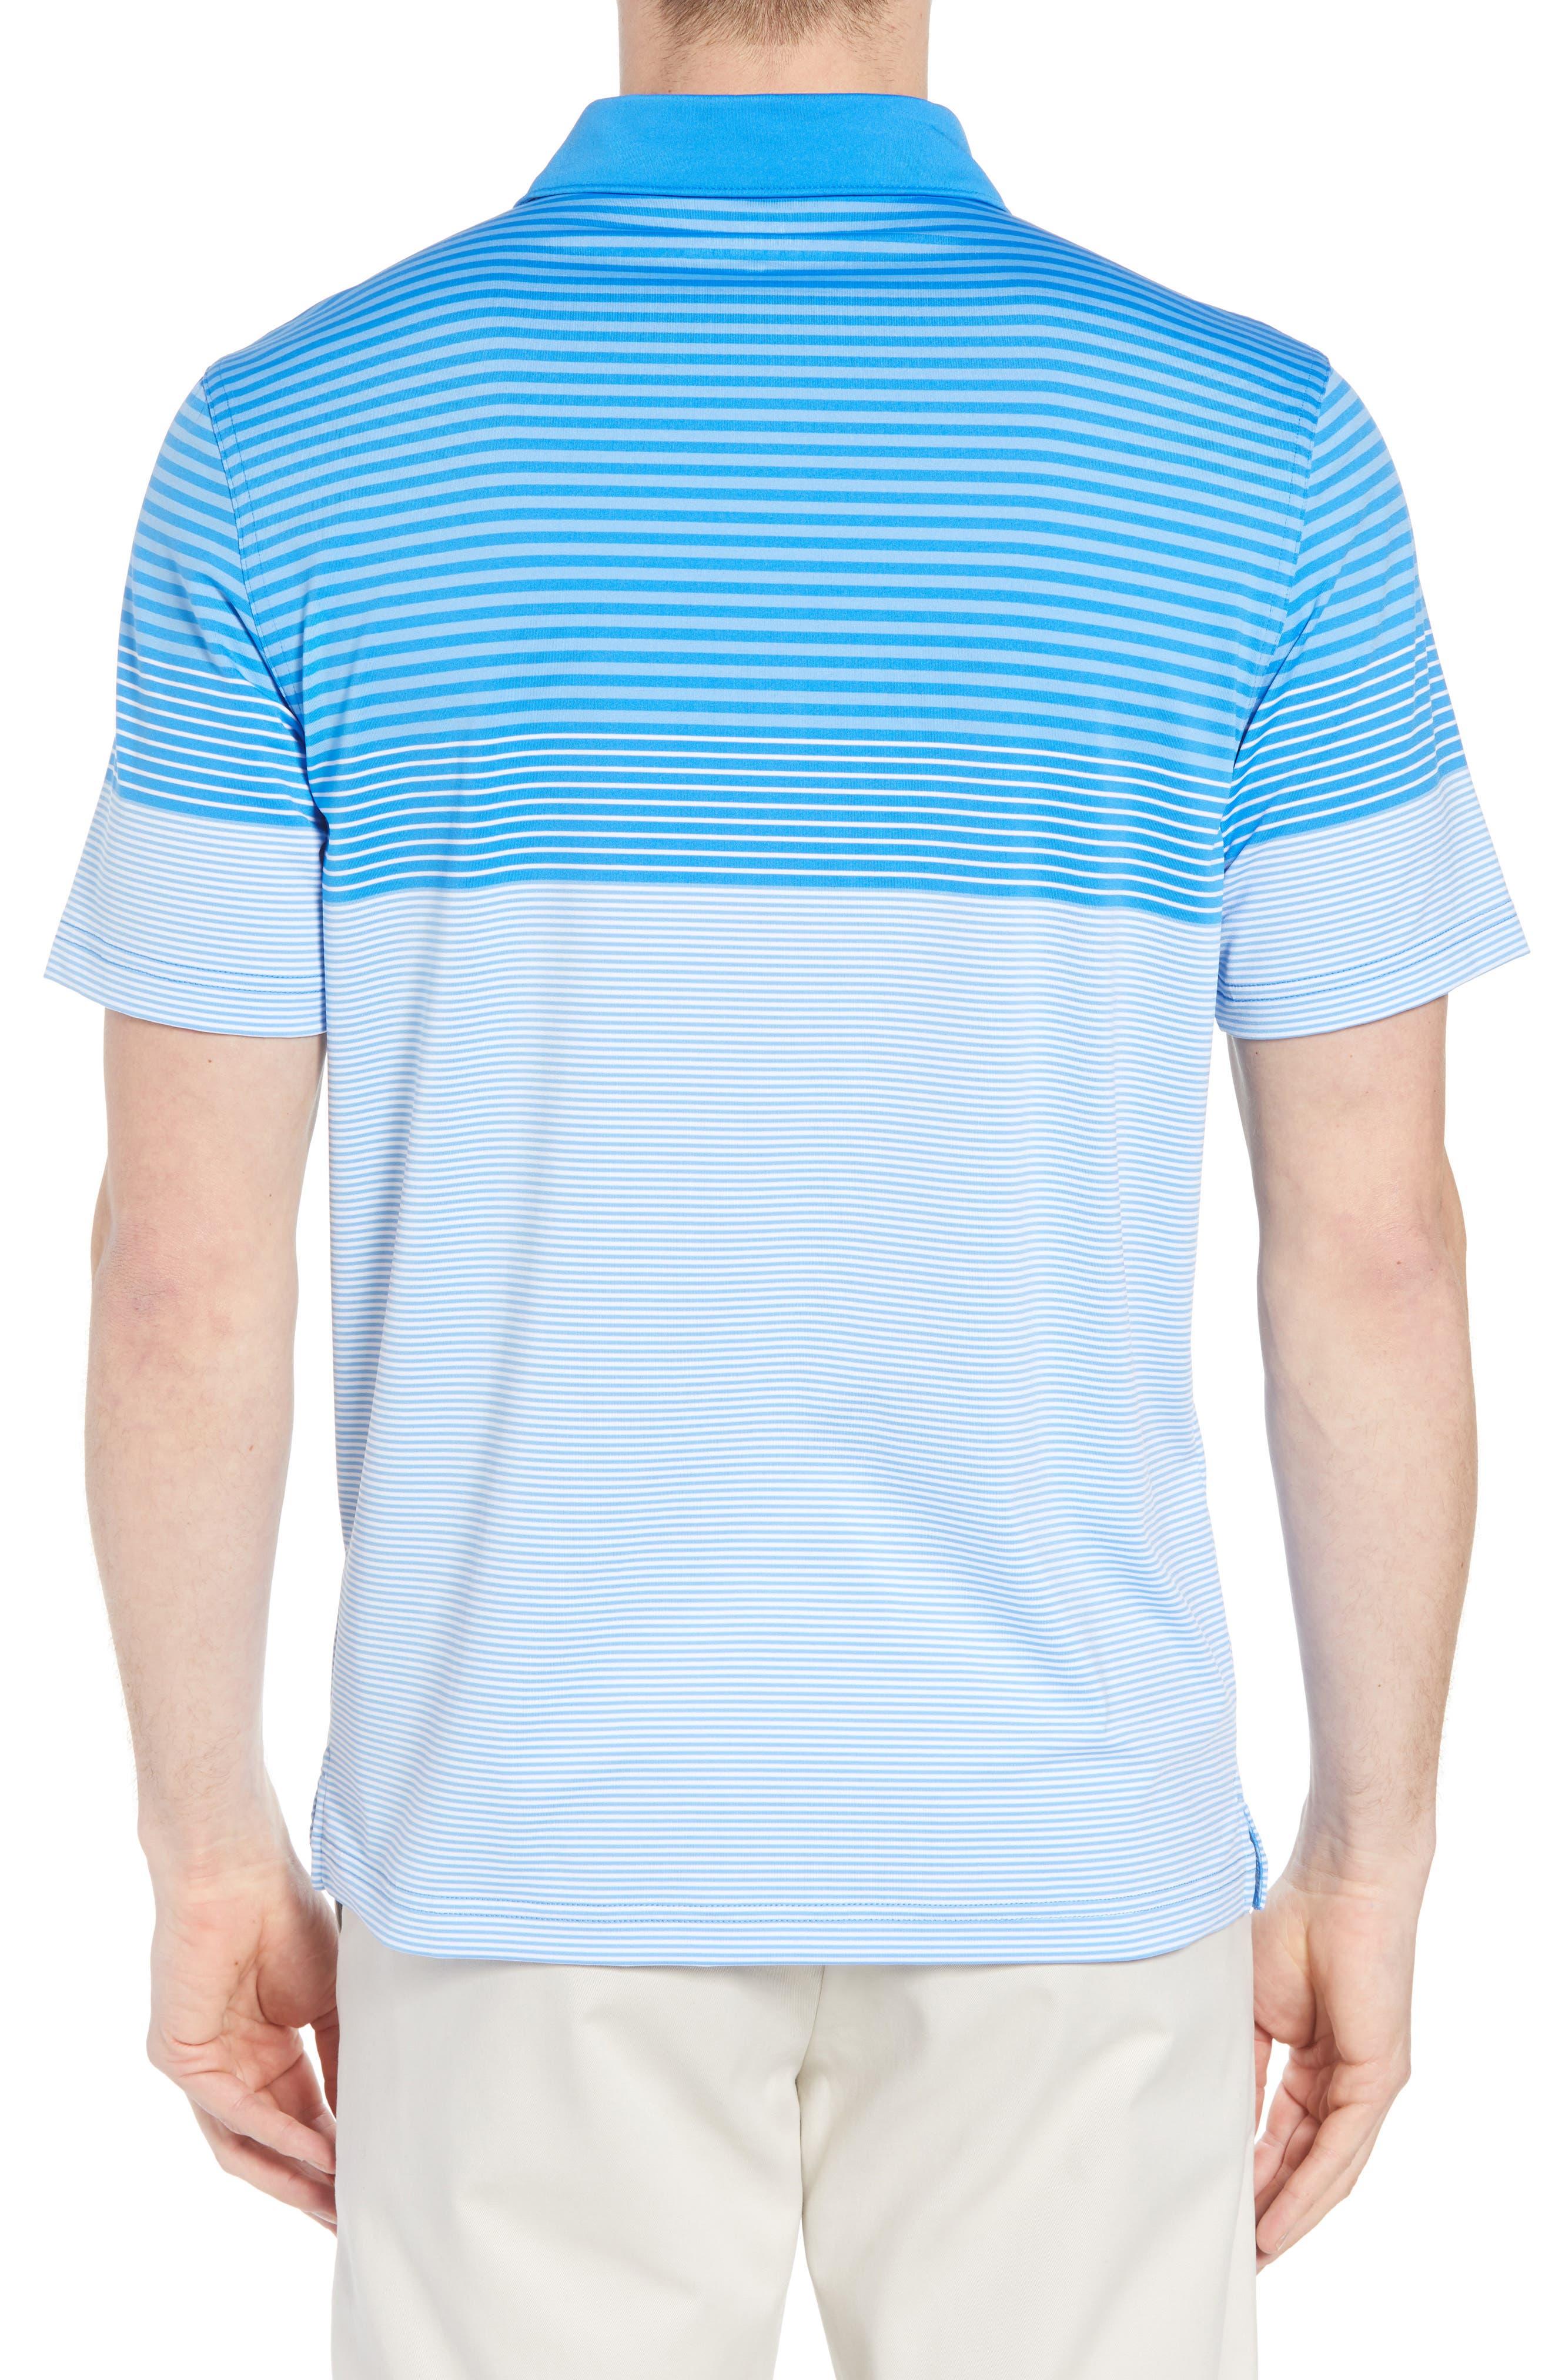 Regular Fit Engineer Stripe Sankaty Performance Polo,                             Alternate thumbnail 2, color,                             Azure Blue